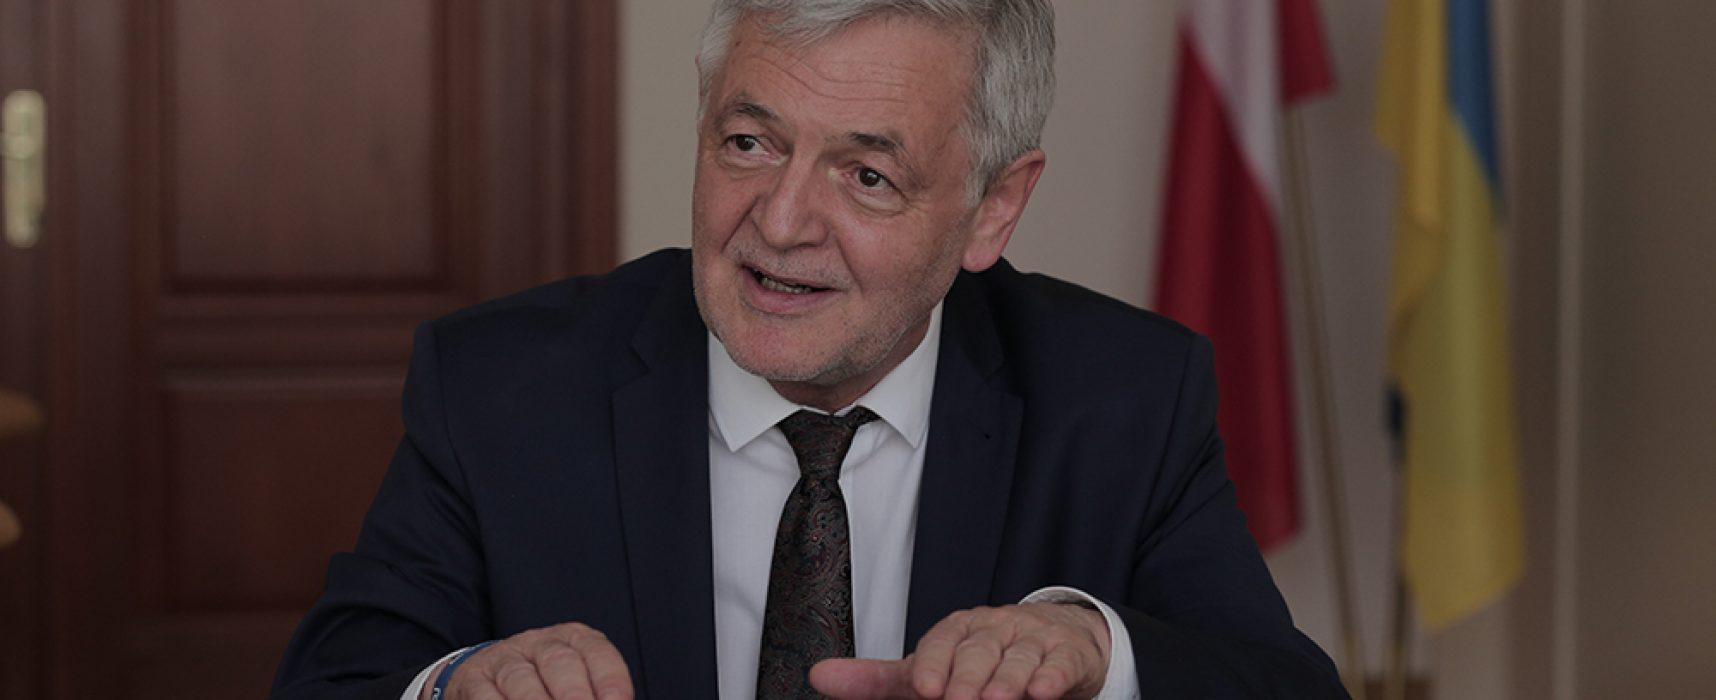 Fake: Polish Ambassador Wants Yugoslav Scenario for Ukraine